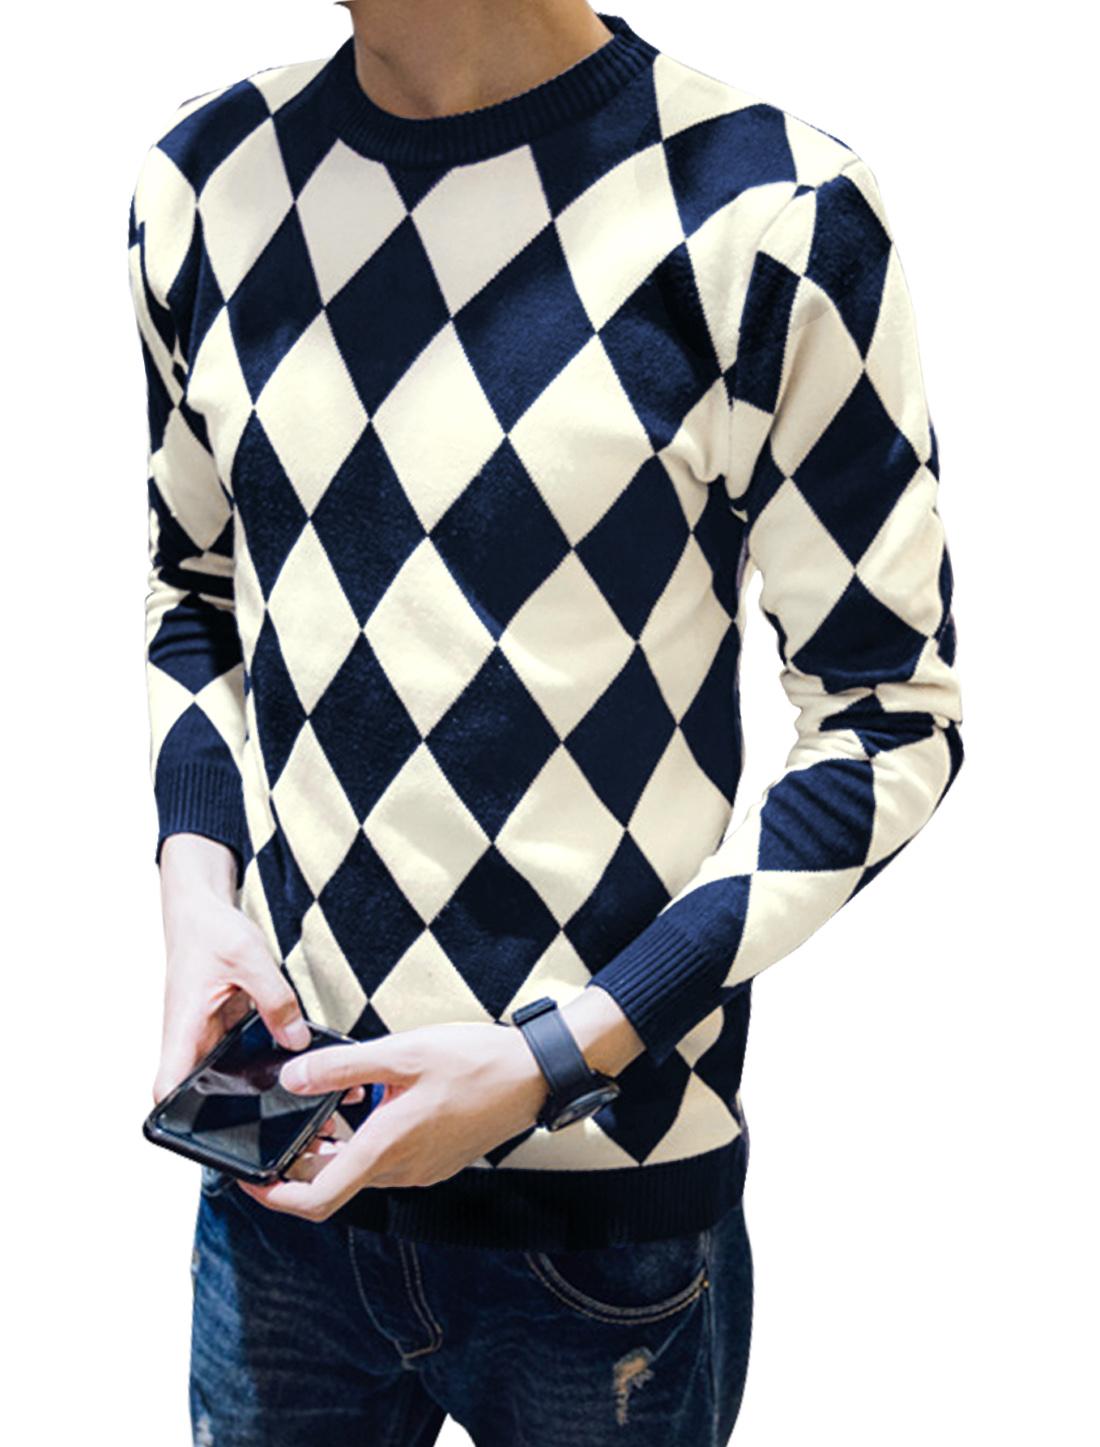 Men Crew Neck Argyle Pattern Knitting Shirt Navy Blue M